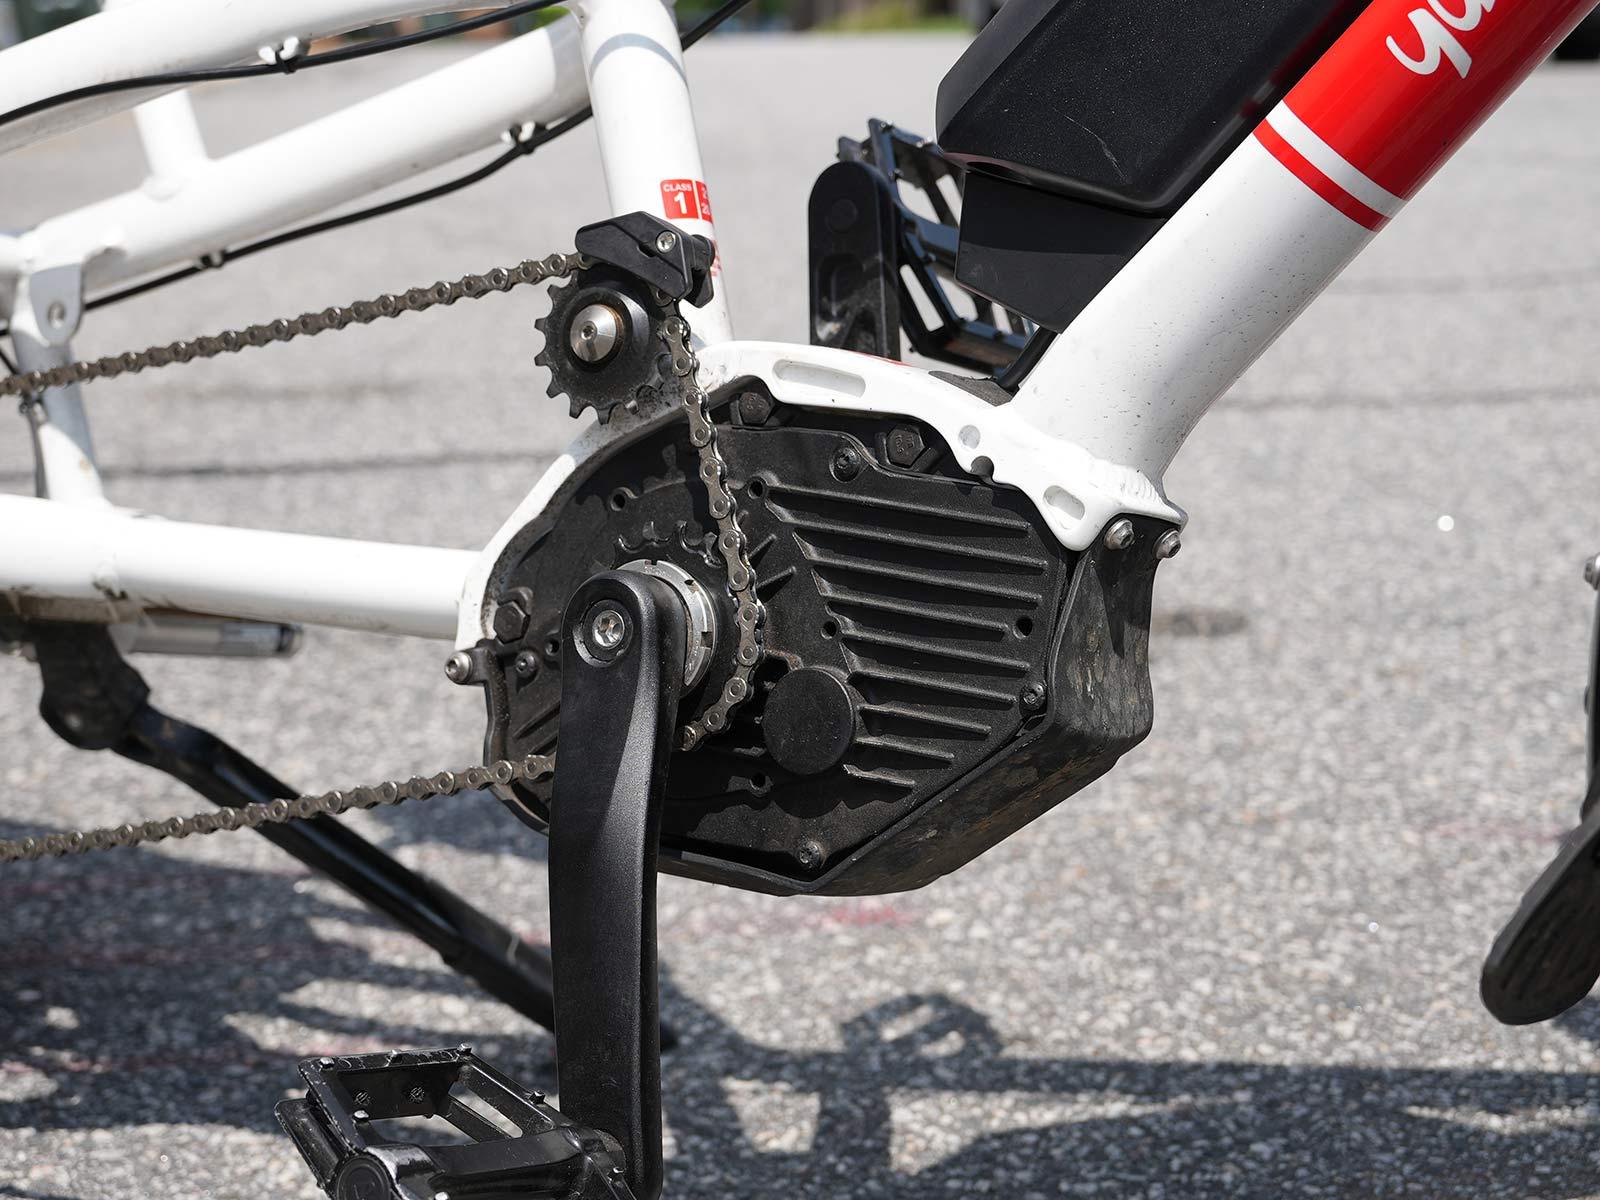 smaller undersized chainring on an e-bike